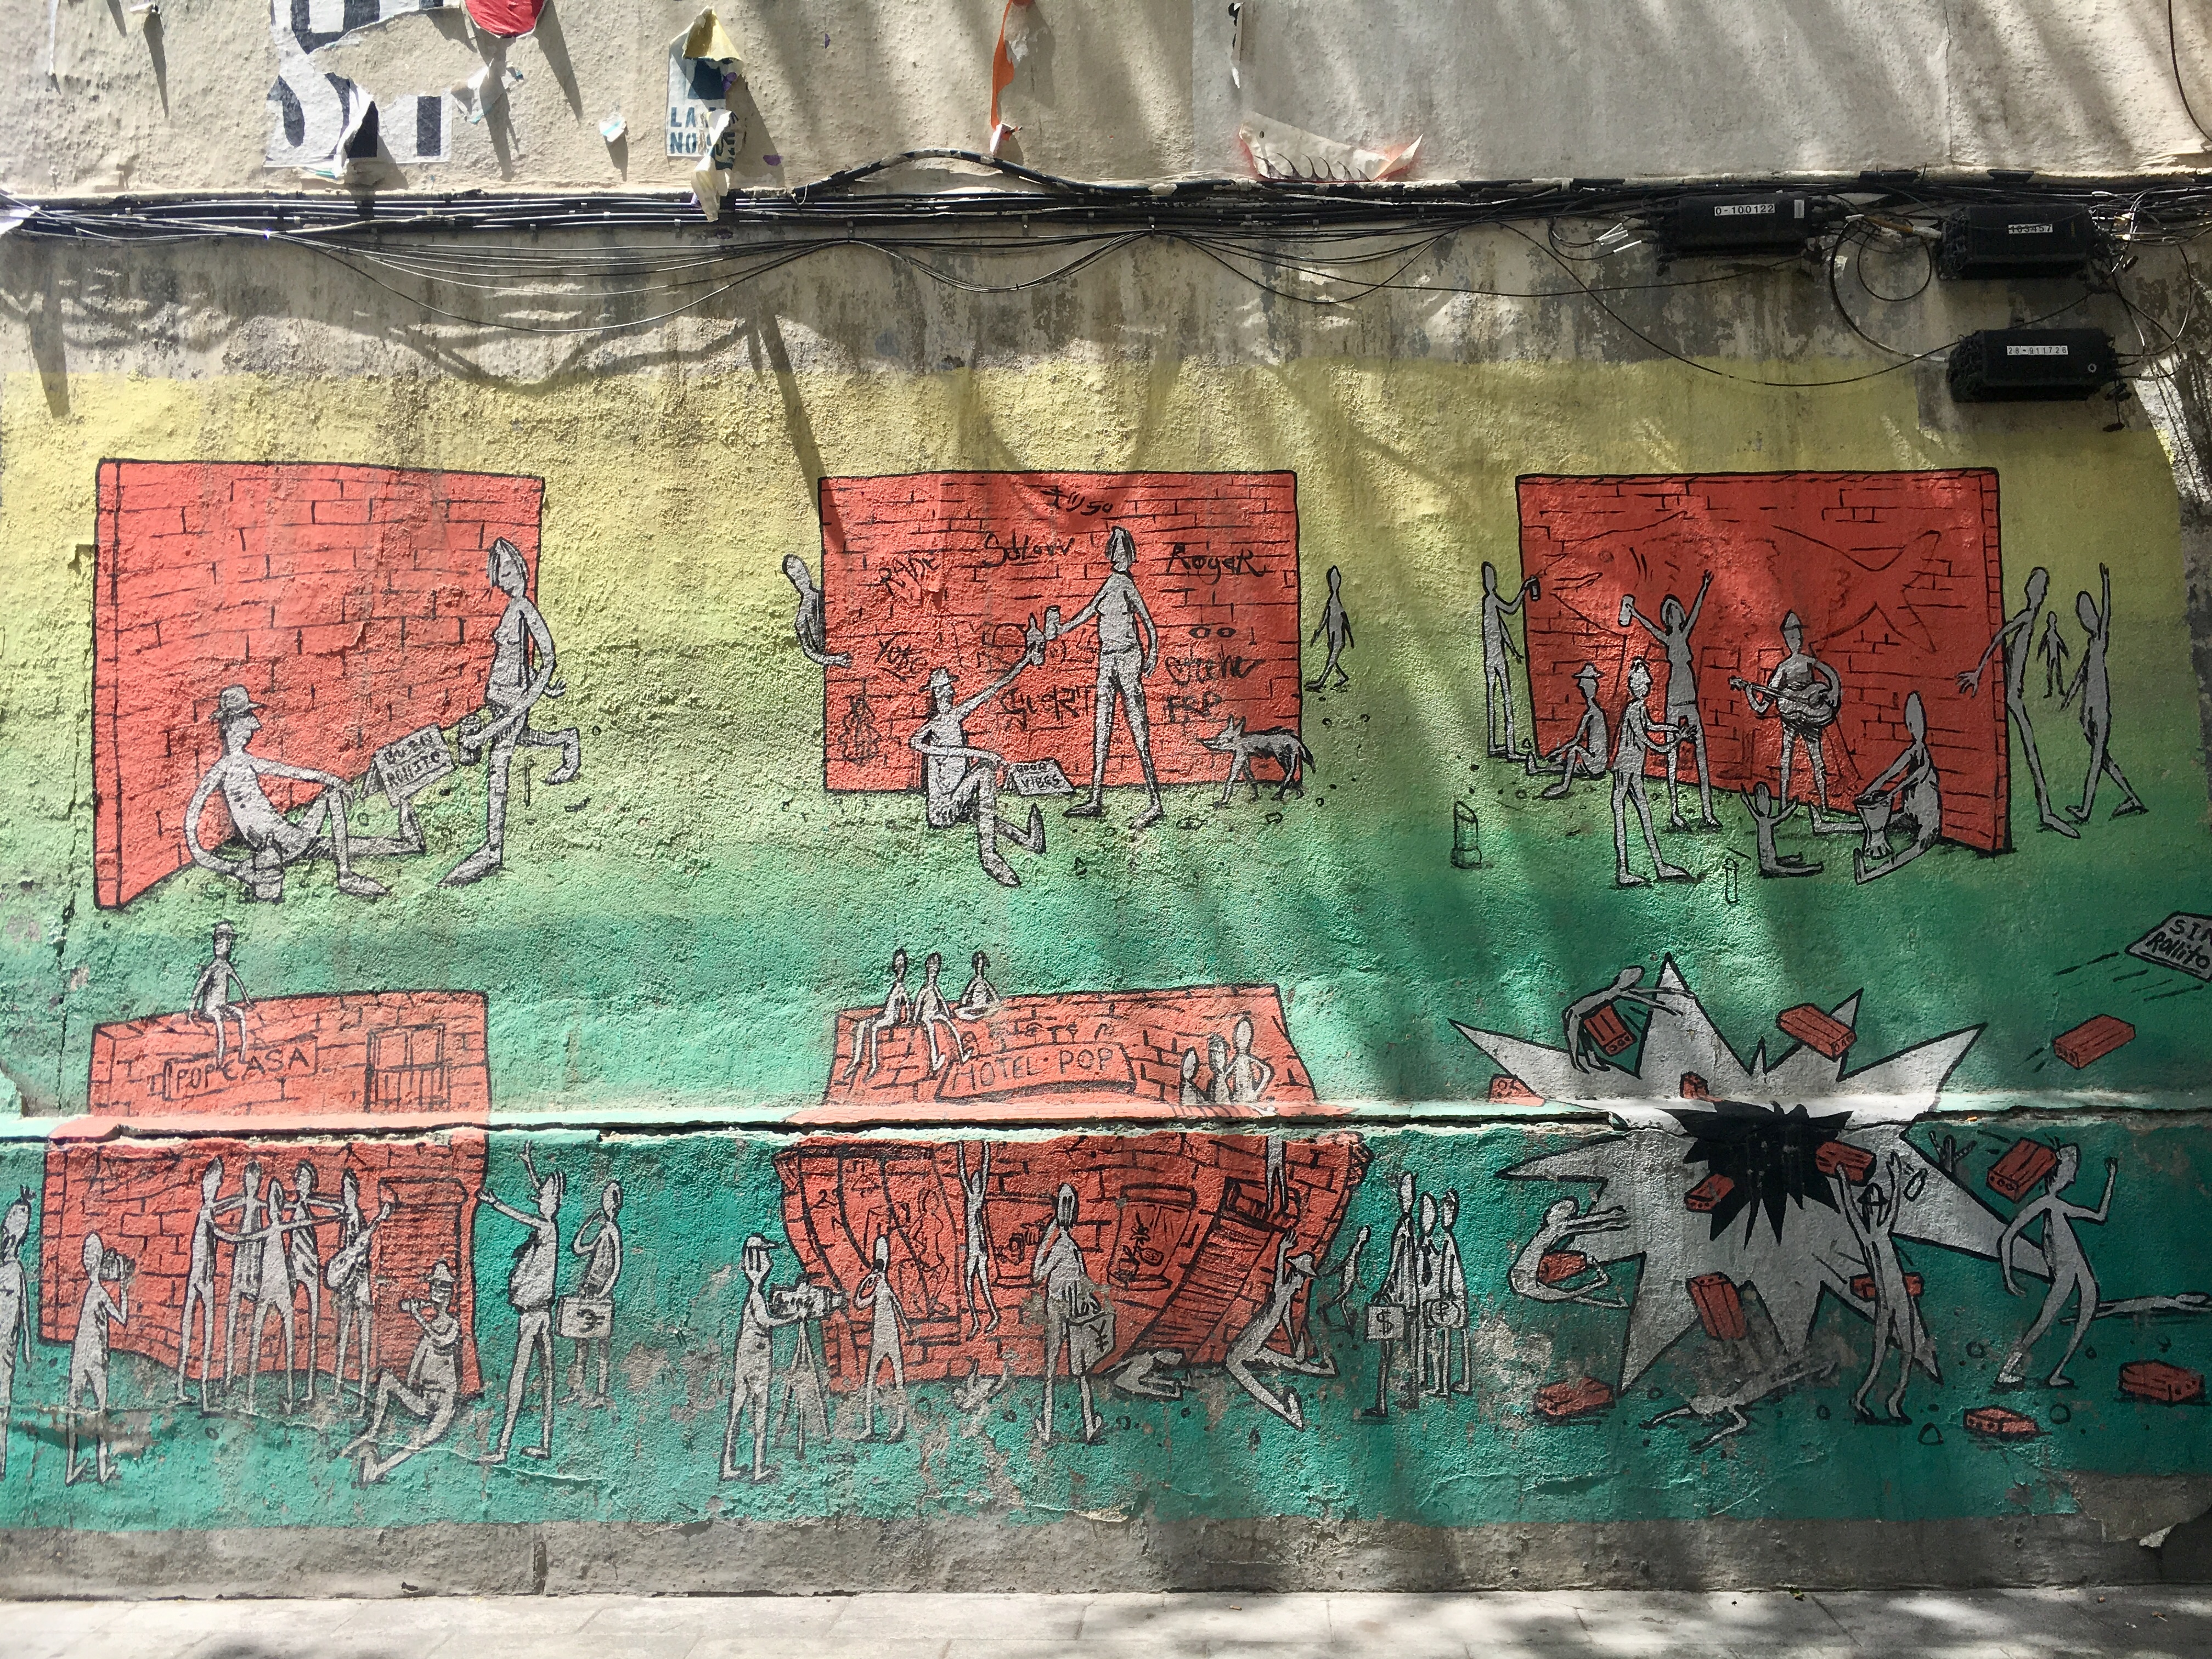 Street Art near Plaza de Lavapiés referencing gentrification